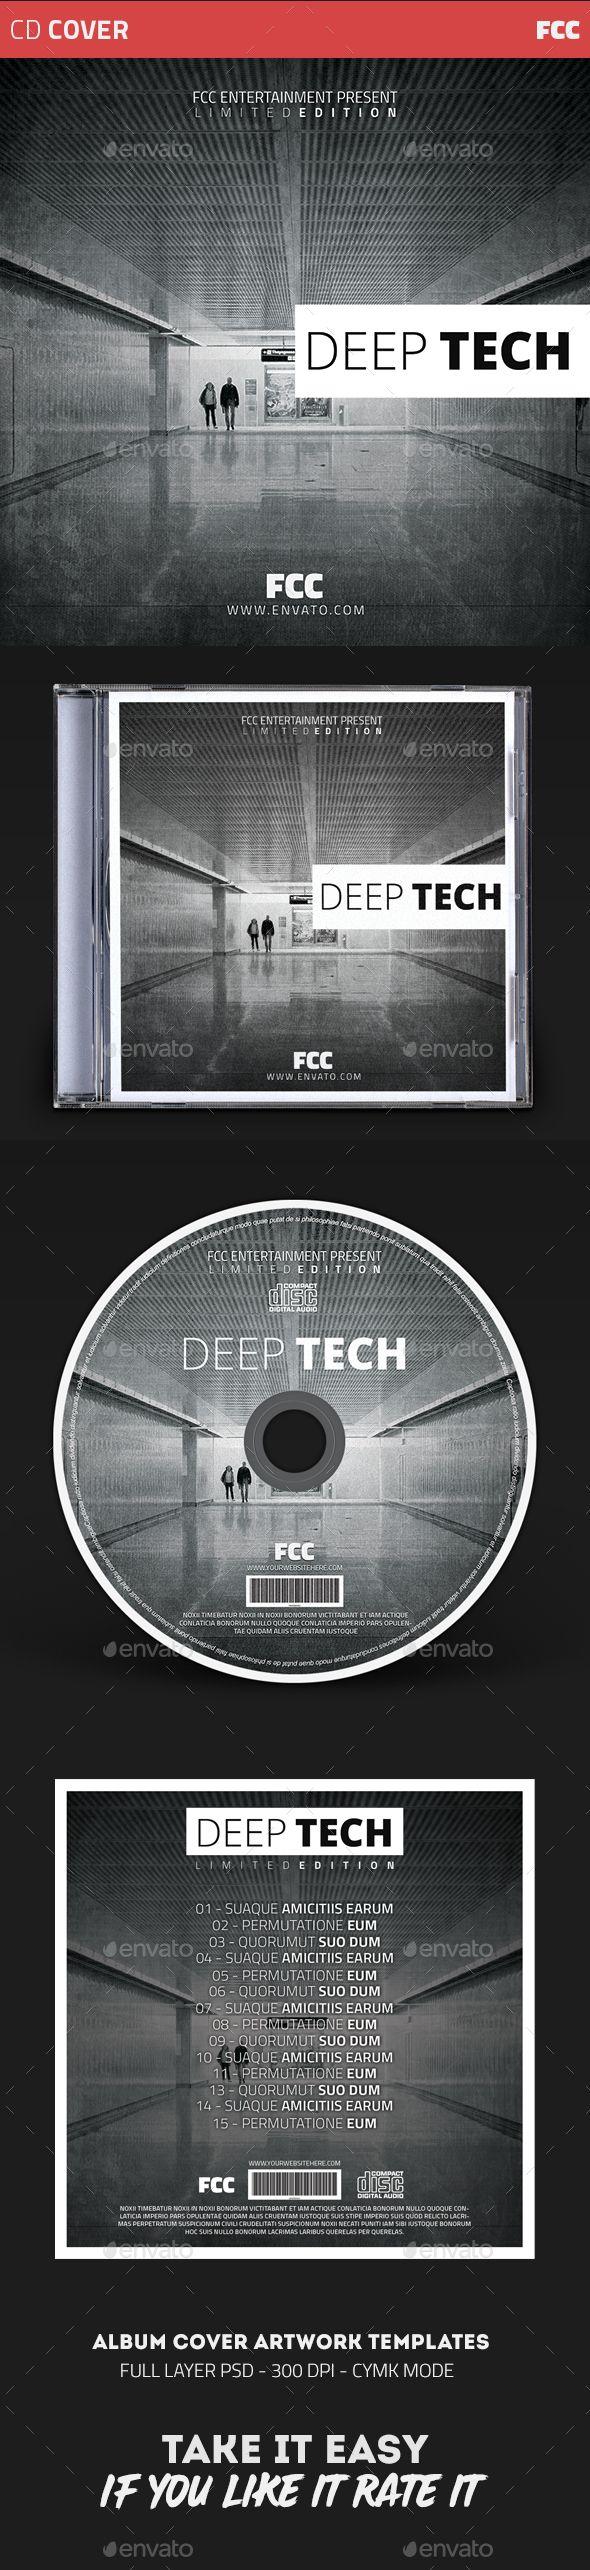 Mejores 149 imágenes de CD & DVD Templates en Pinterest   Logotipo ...